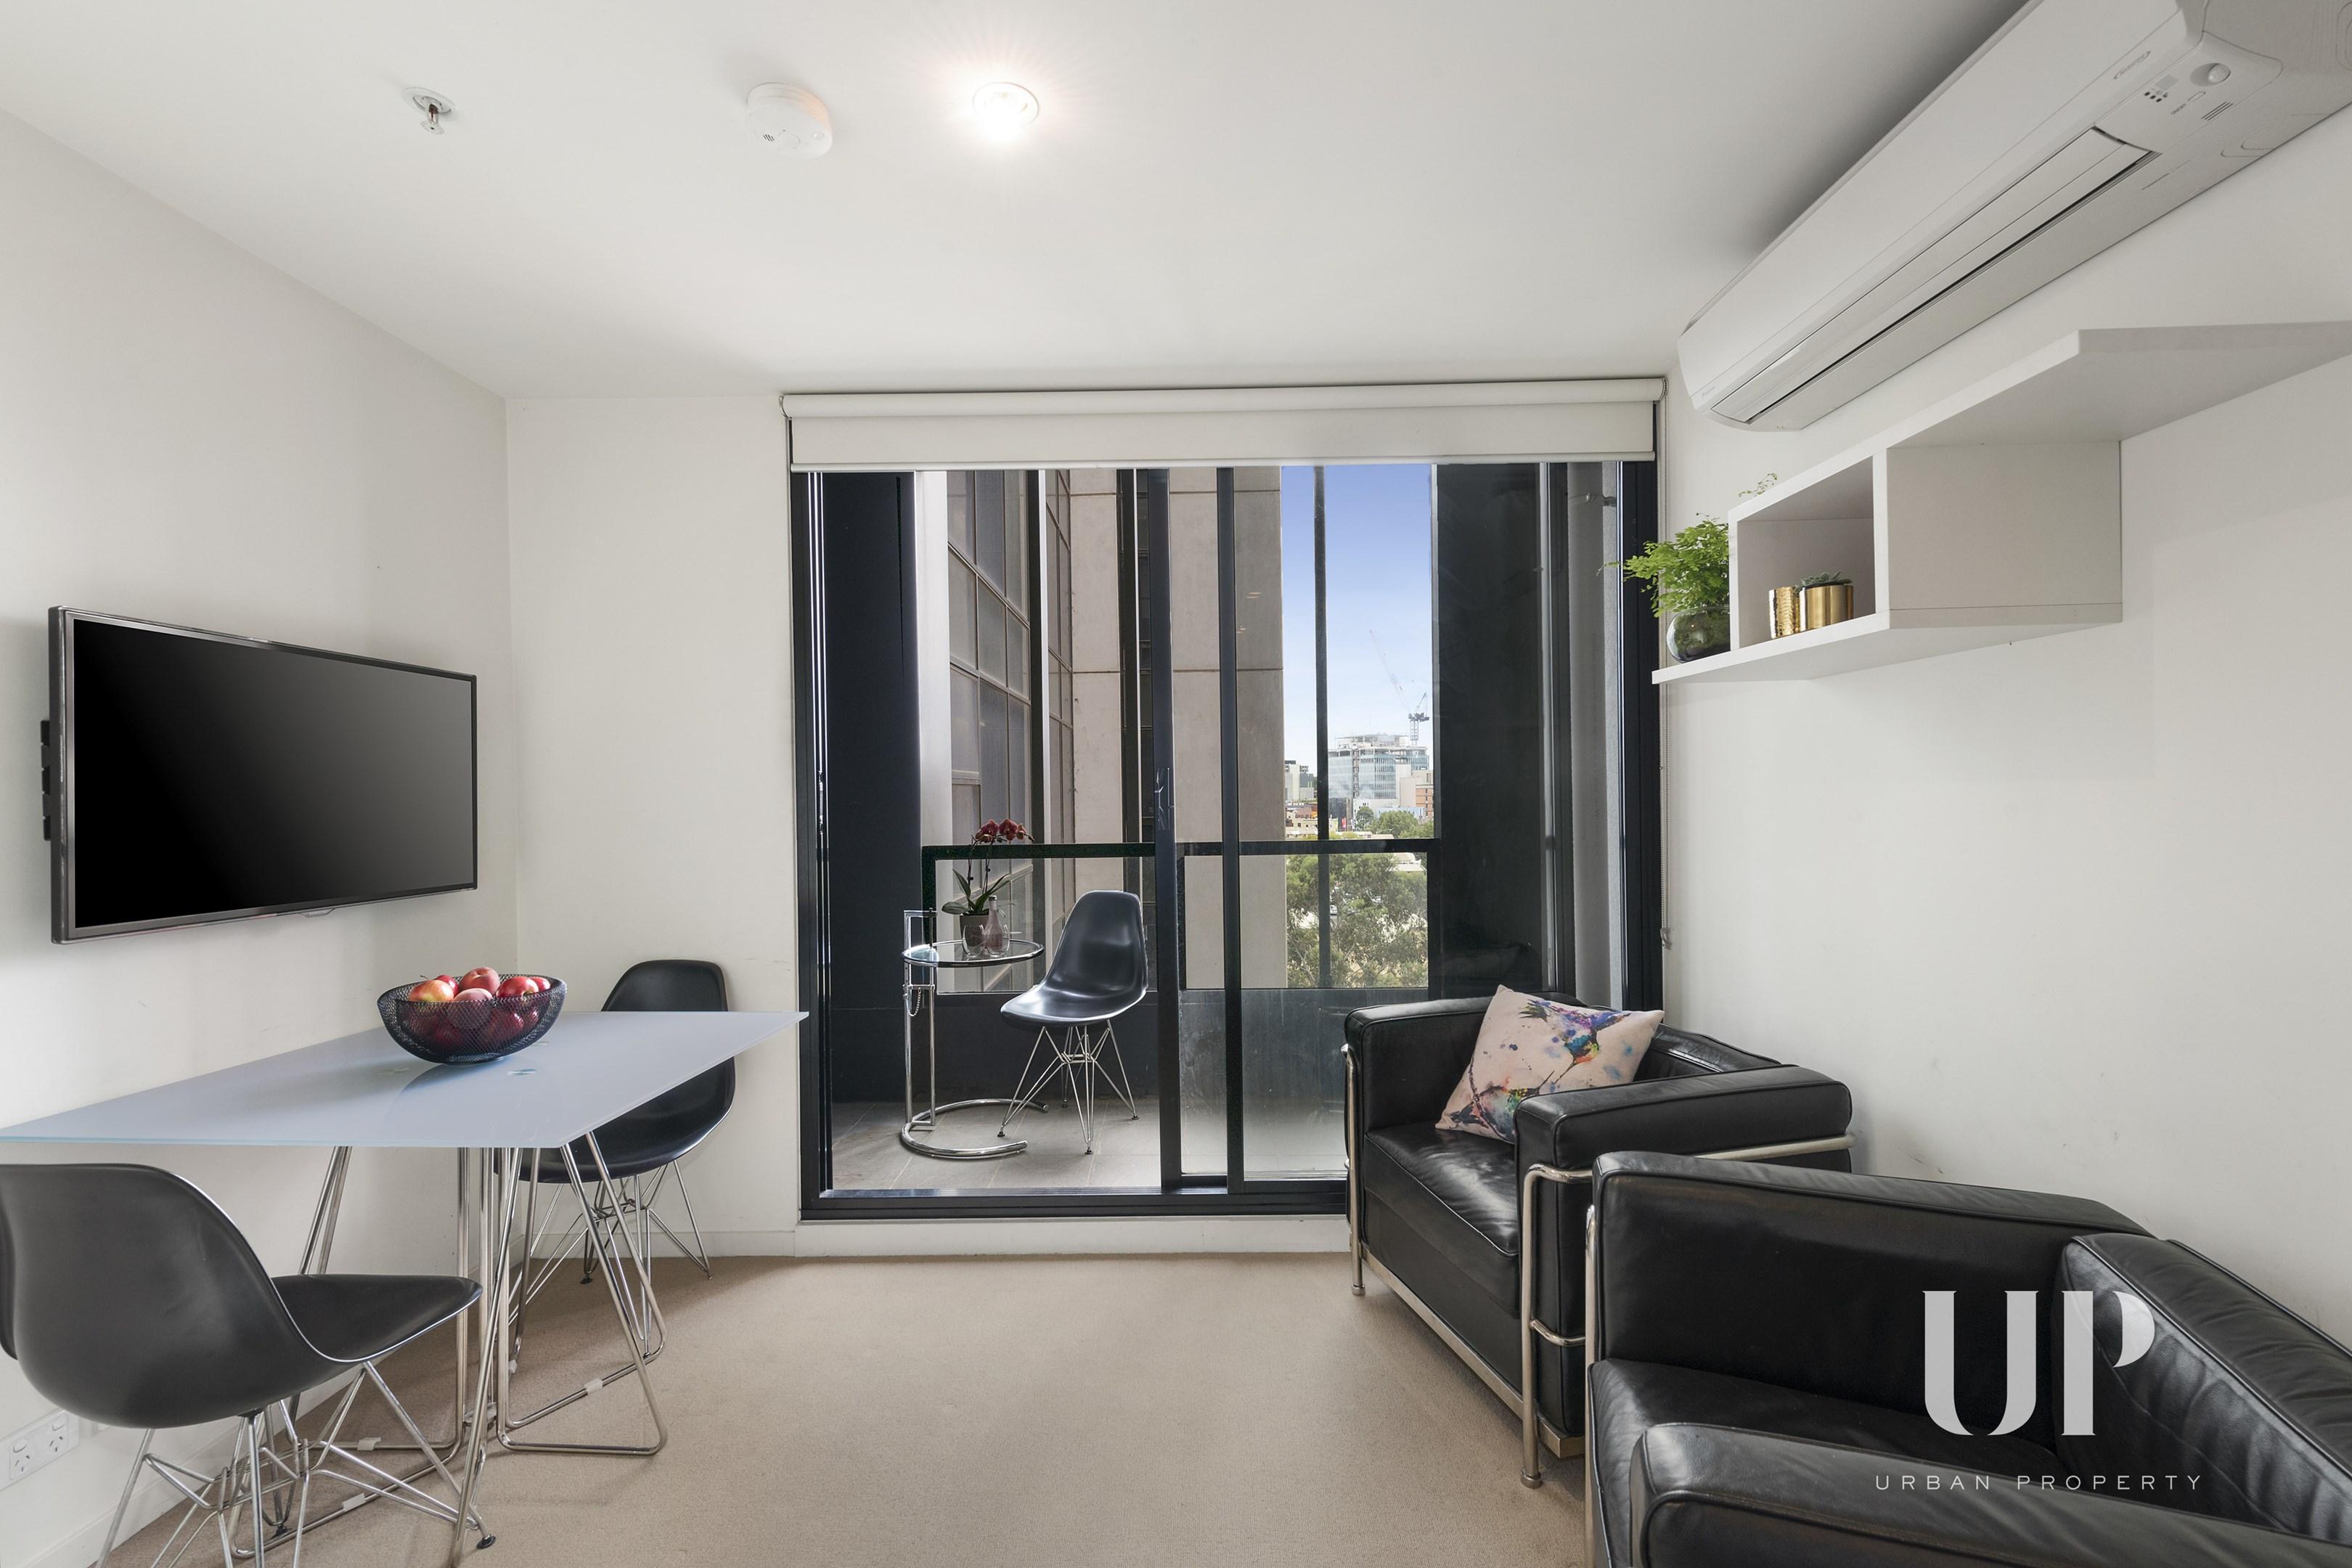 243 Franklin Street Studio One Bedroom Melbourne Vic 3000 Apartment For Rent 320 410 Domain